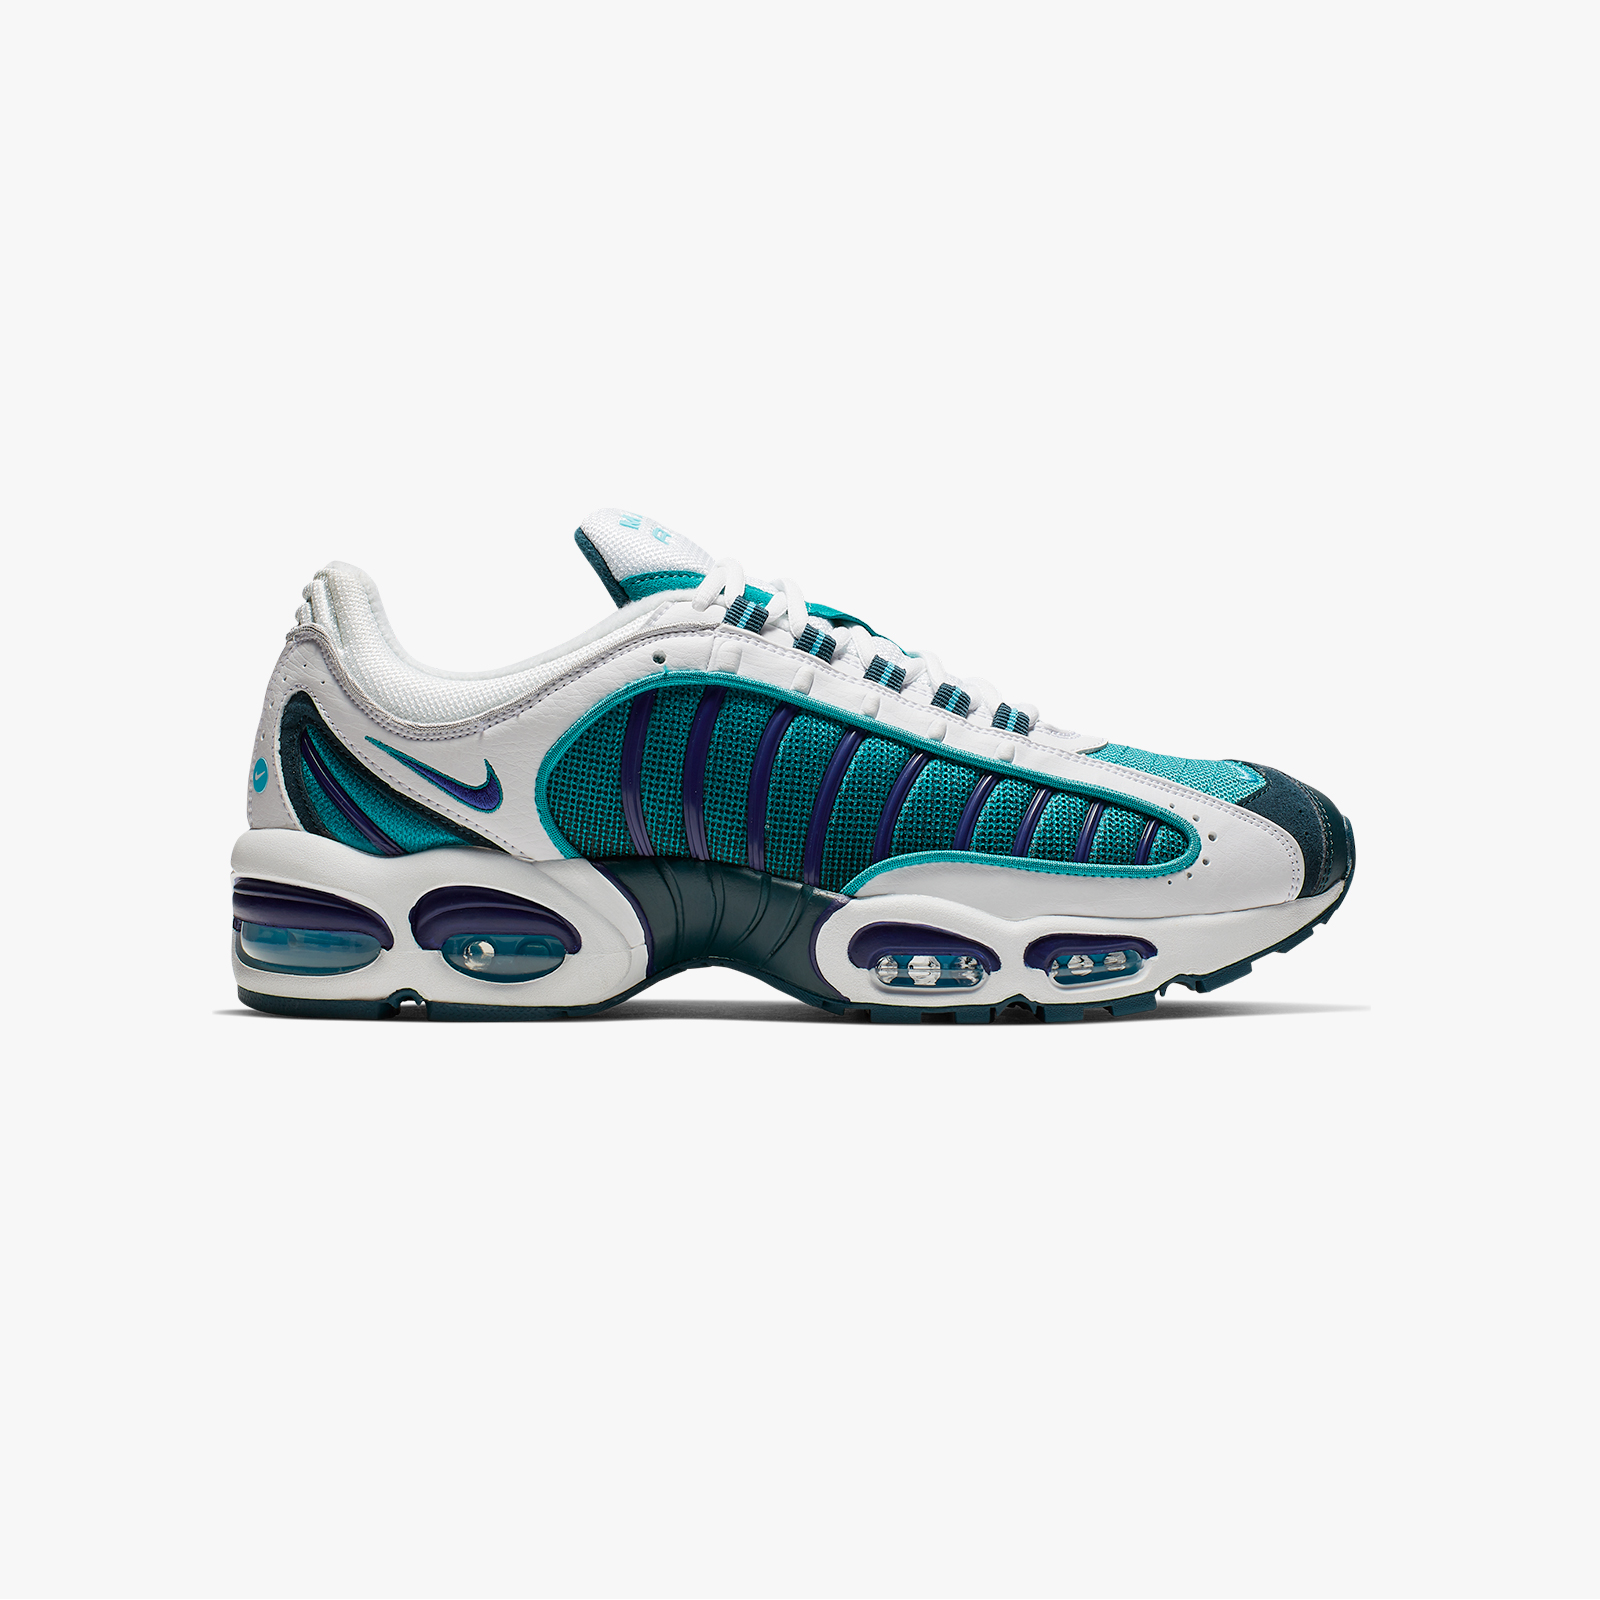 Nike Sportswear Nike Sportswear Air Max Tailwind IV Herren